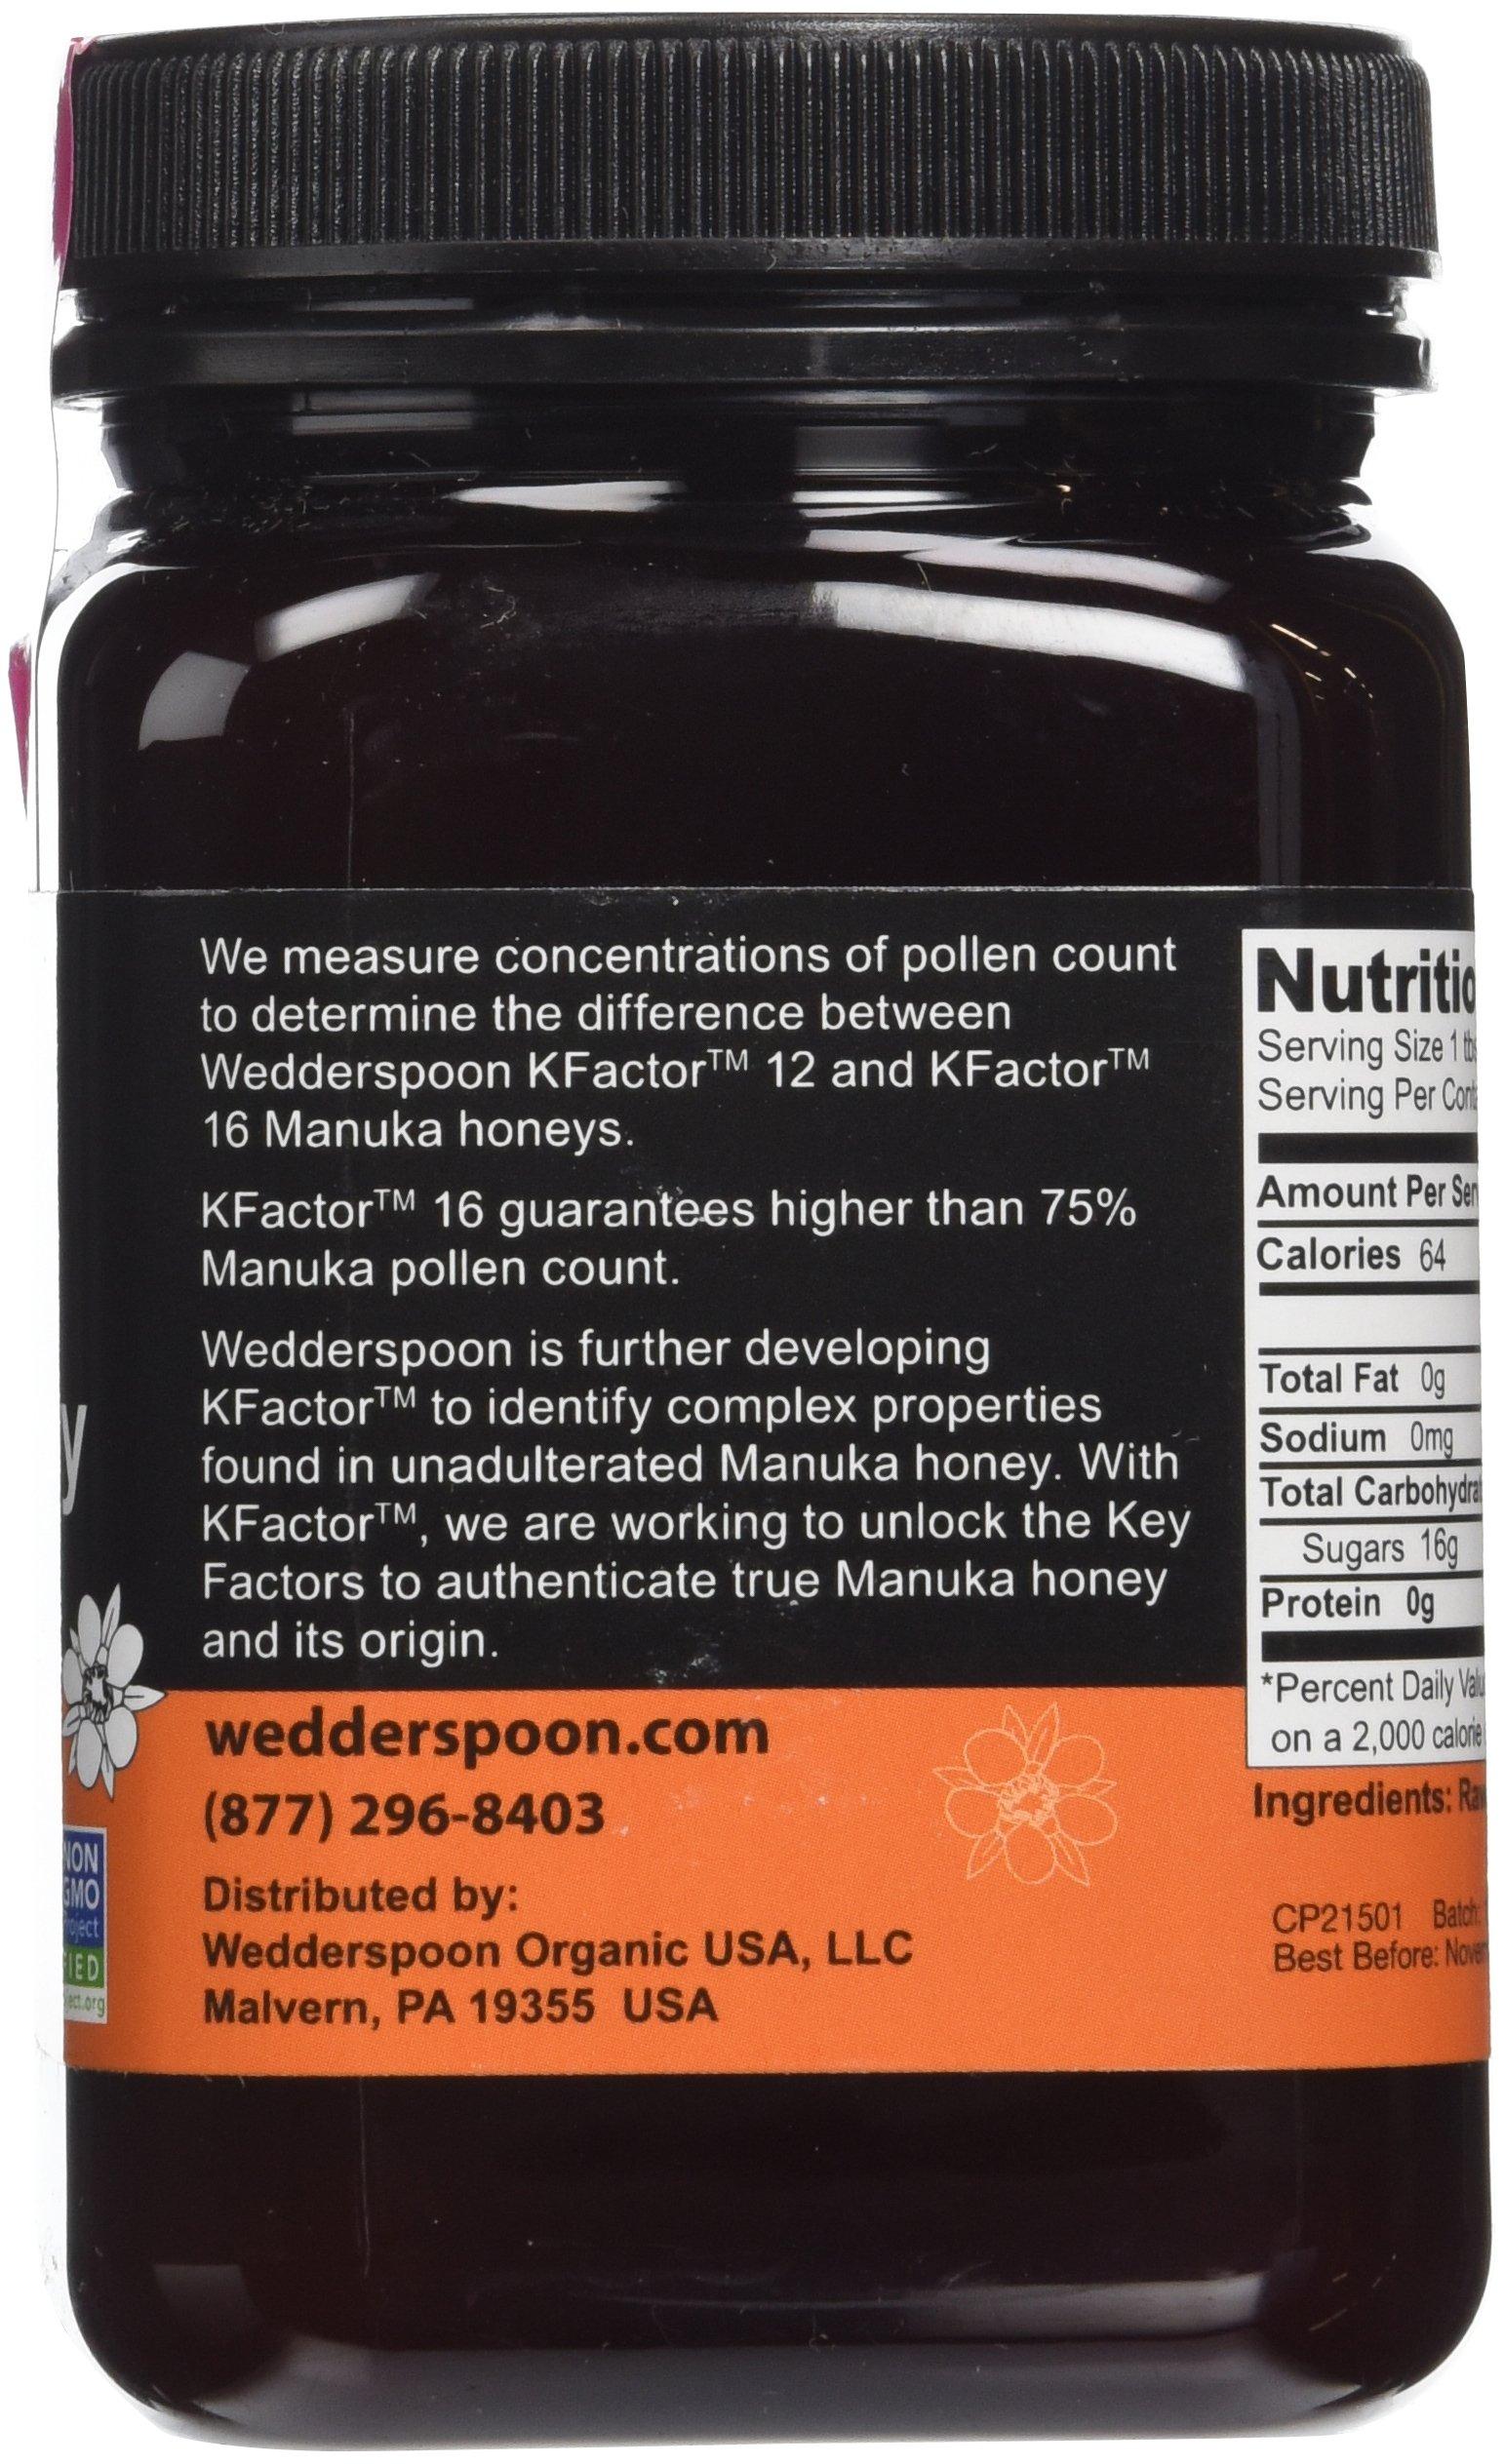 Wedderspoon Raw Manuka Honey Active 16+, 17.6-Ounce Jar (two pack)